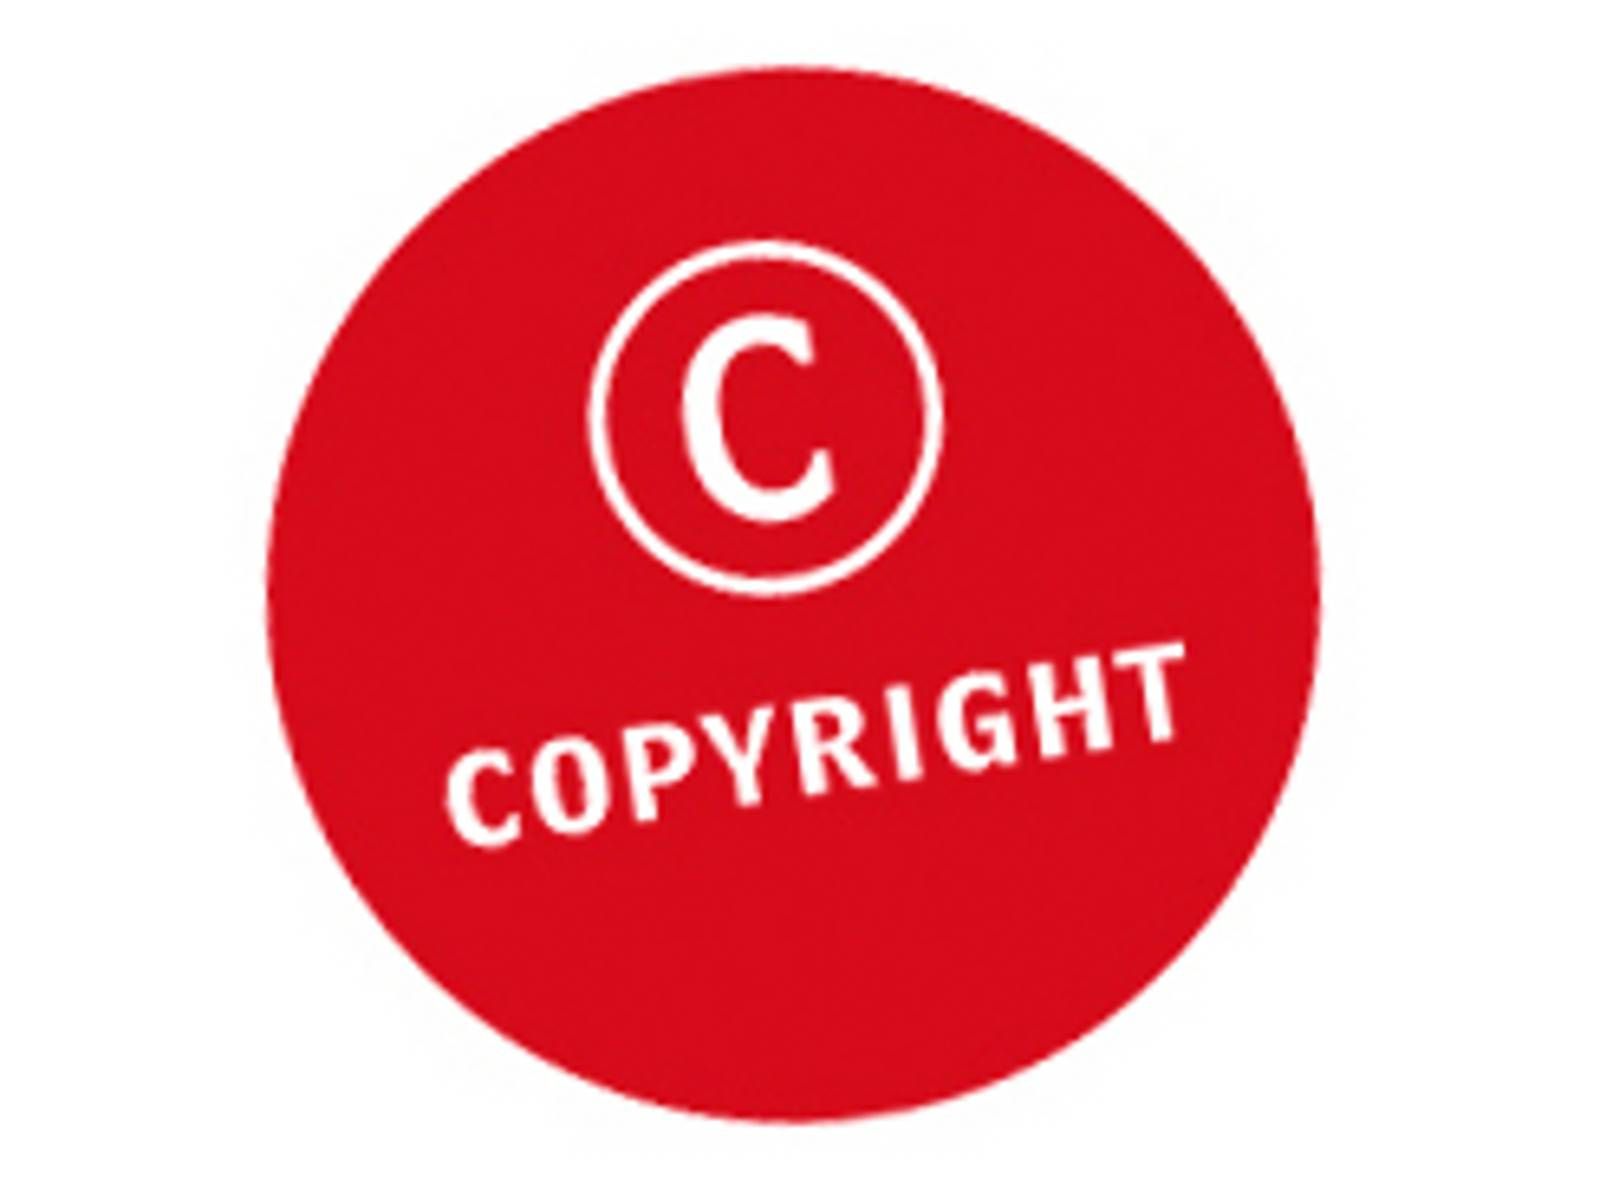 Copyright Stadtentwässerung Hannover